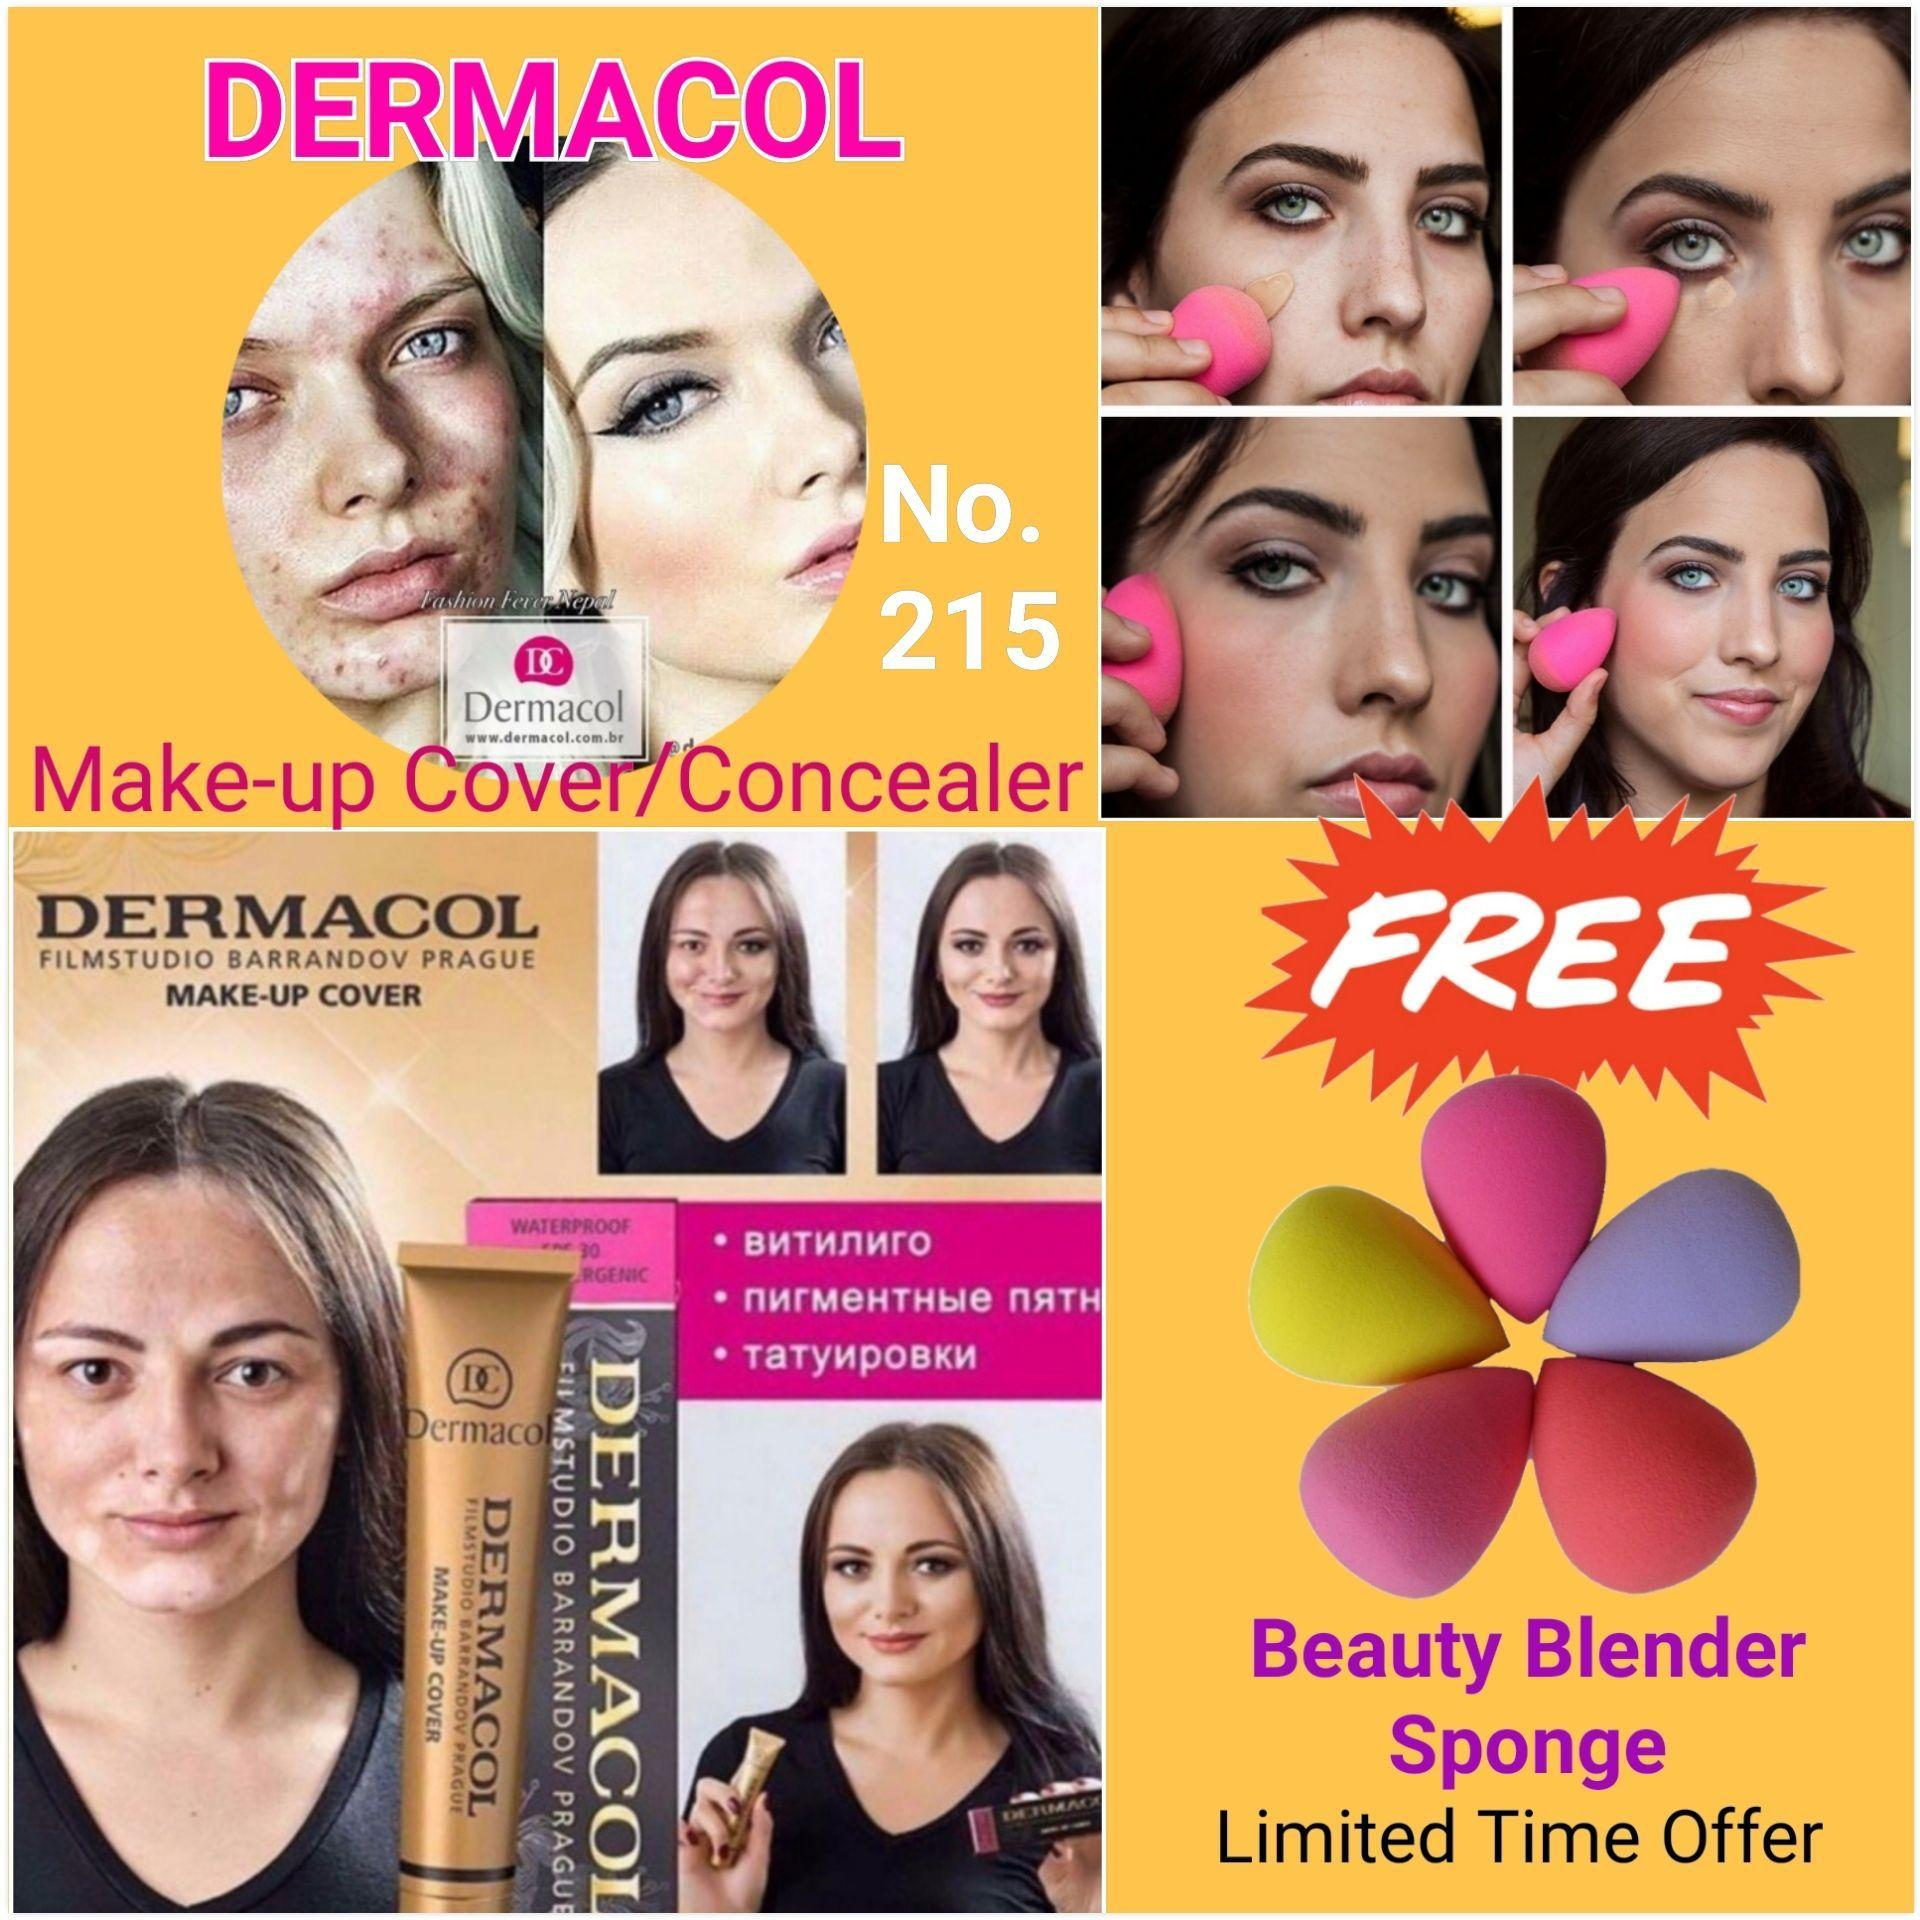 Dermacol Make up Cover/Foundation (#215) FREE Beauty Blender Sponge Philippines